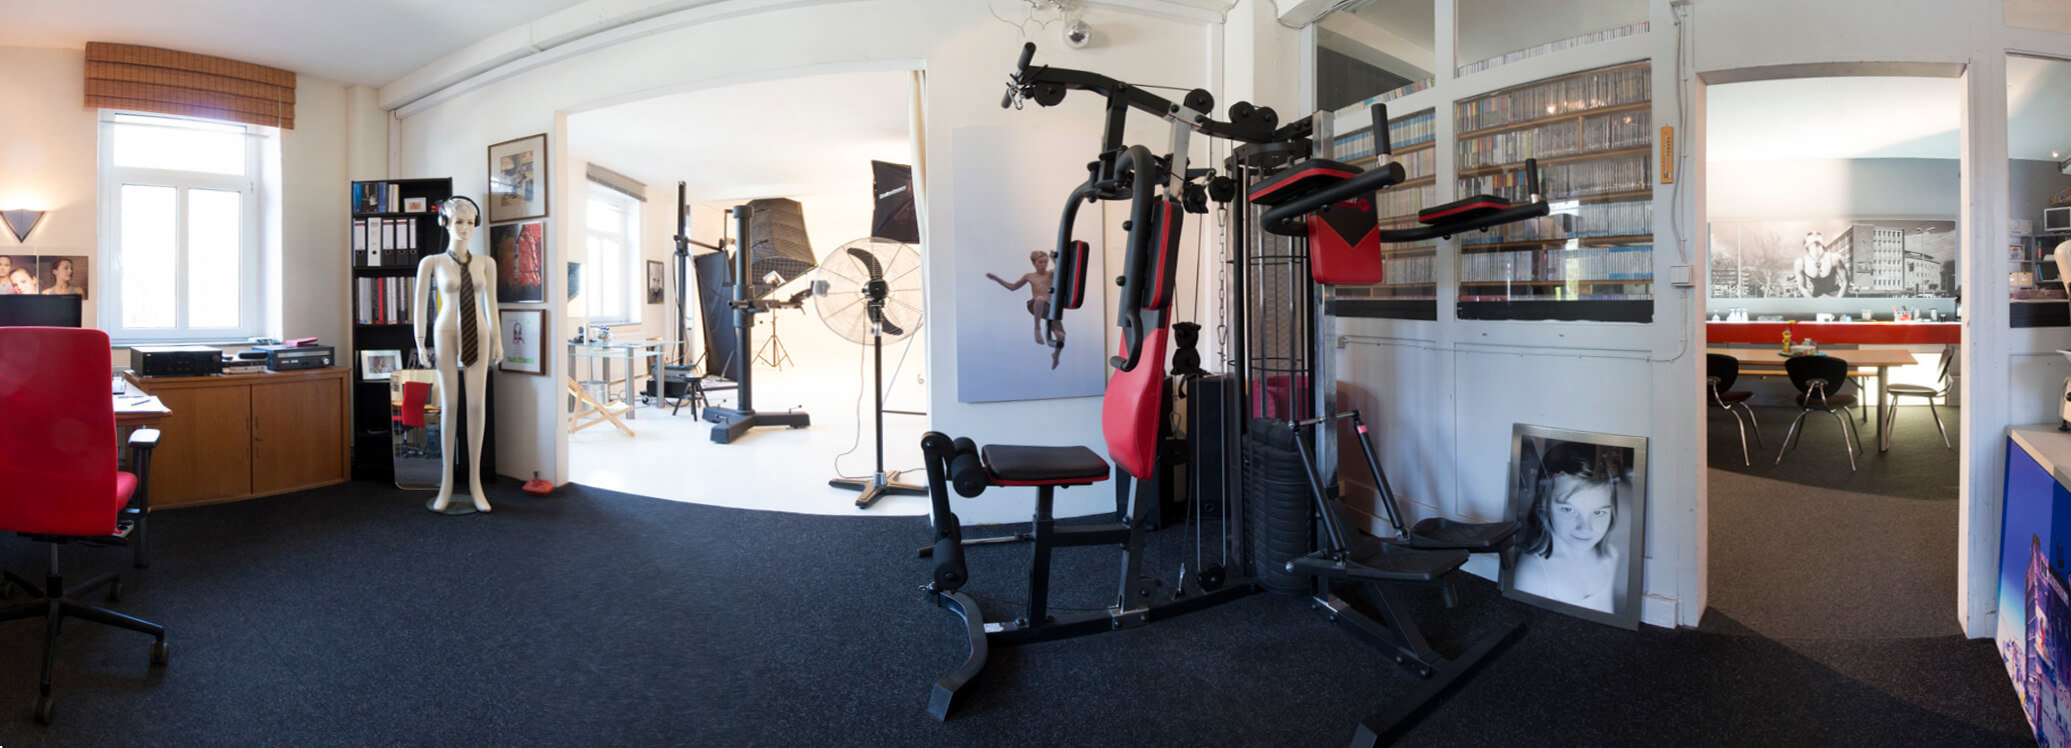 Studio-iX Kreativ Location